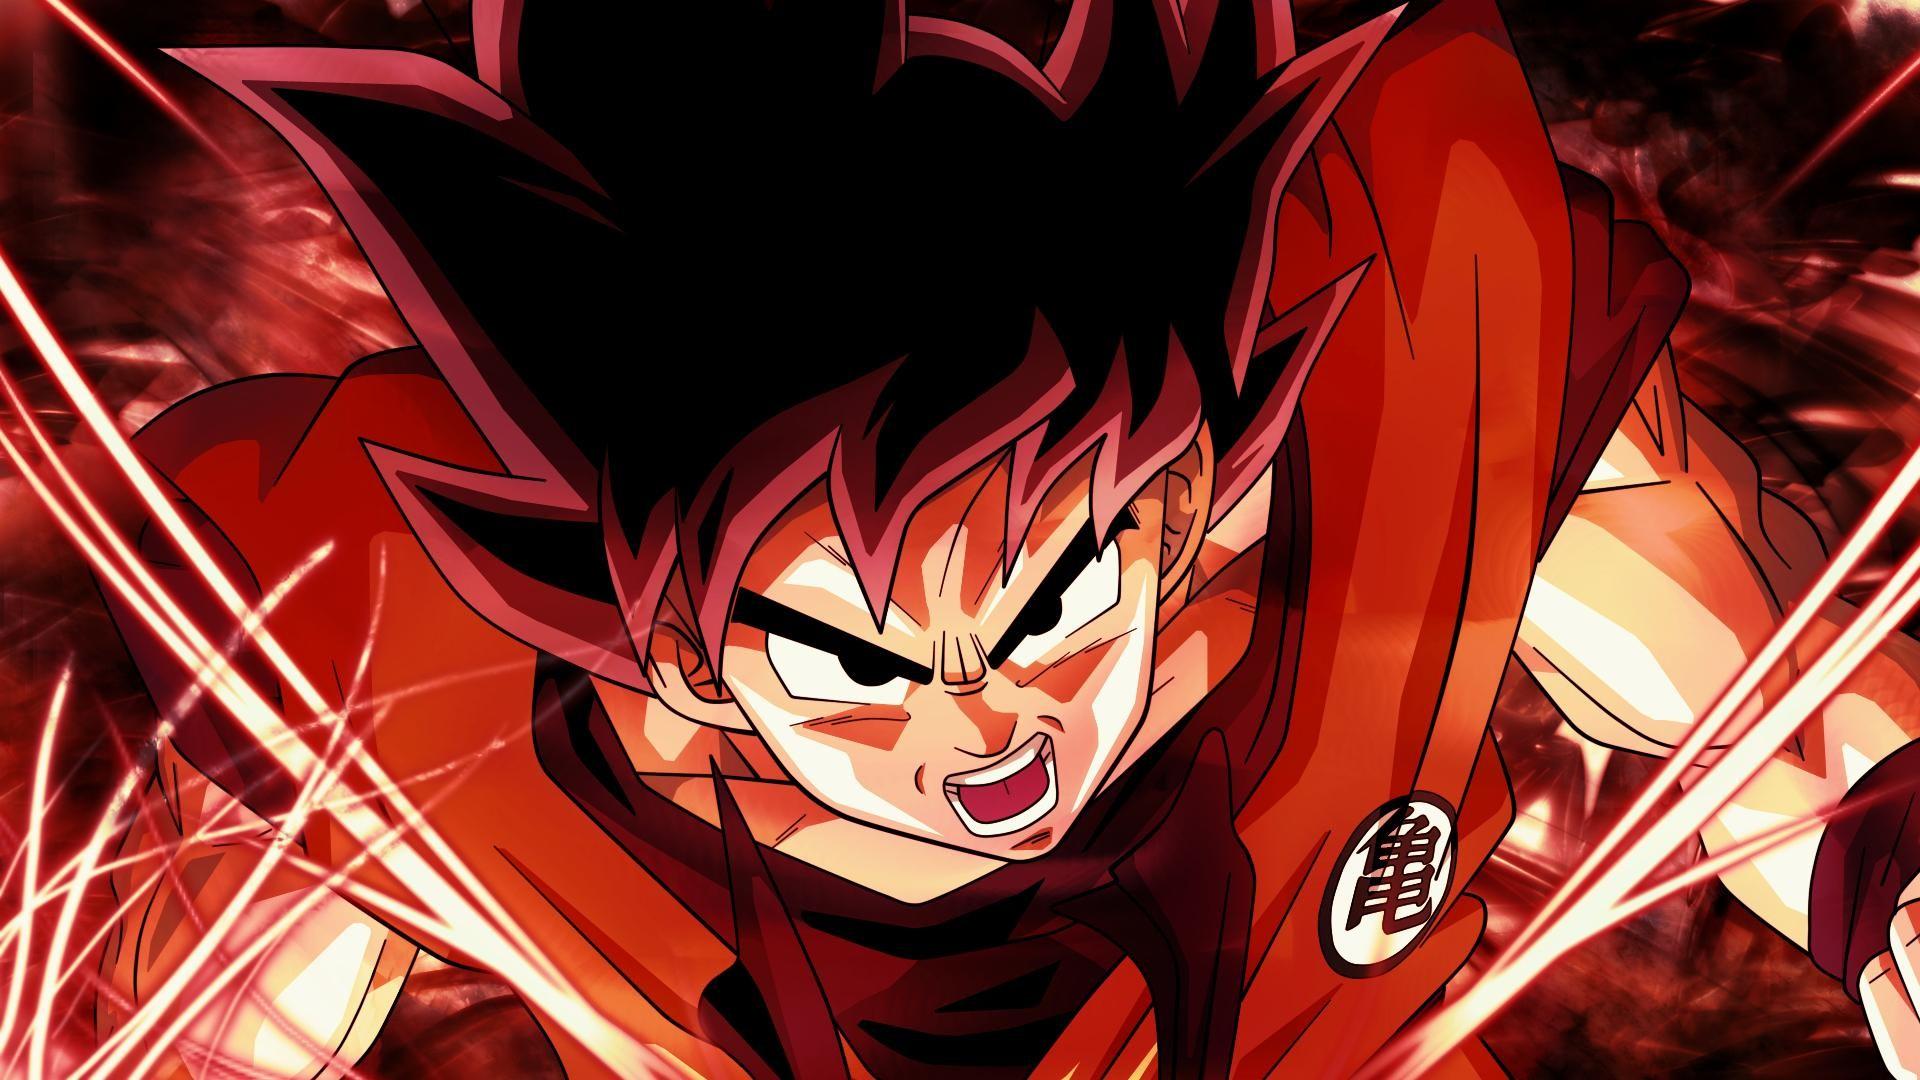 Best-Goku-hd-for-PC-Dragon-Ball-Z-wallpaper-wp640315